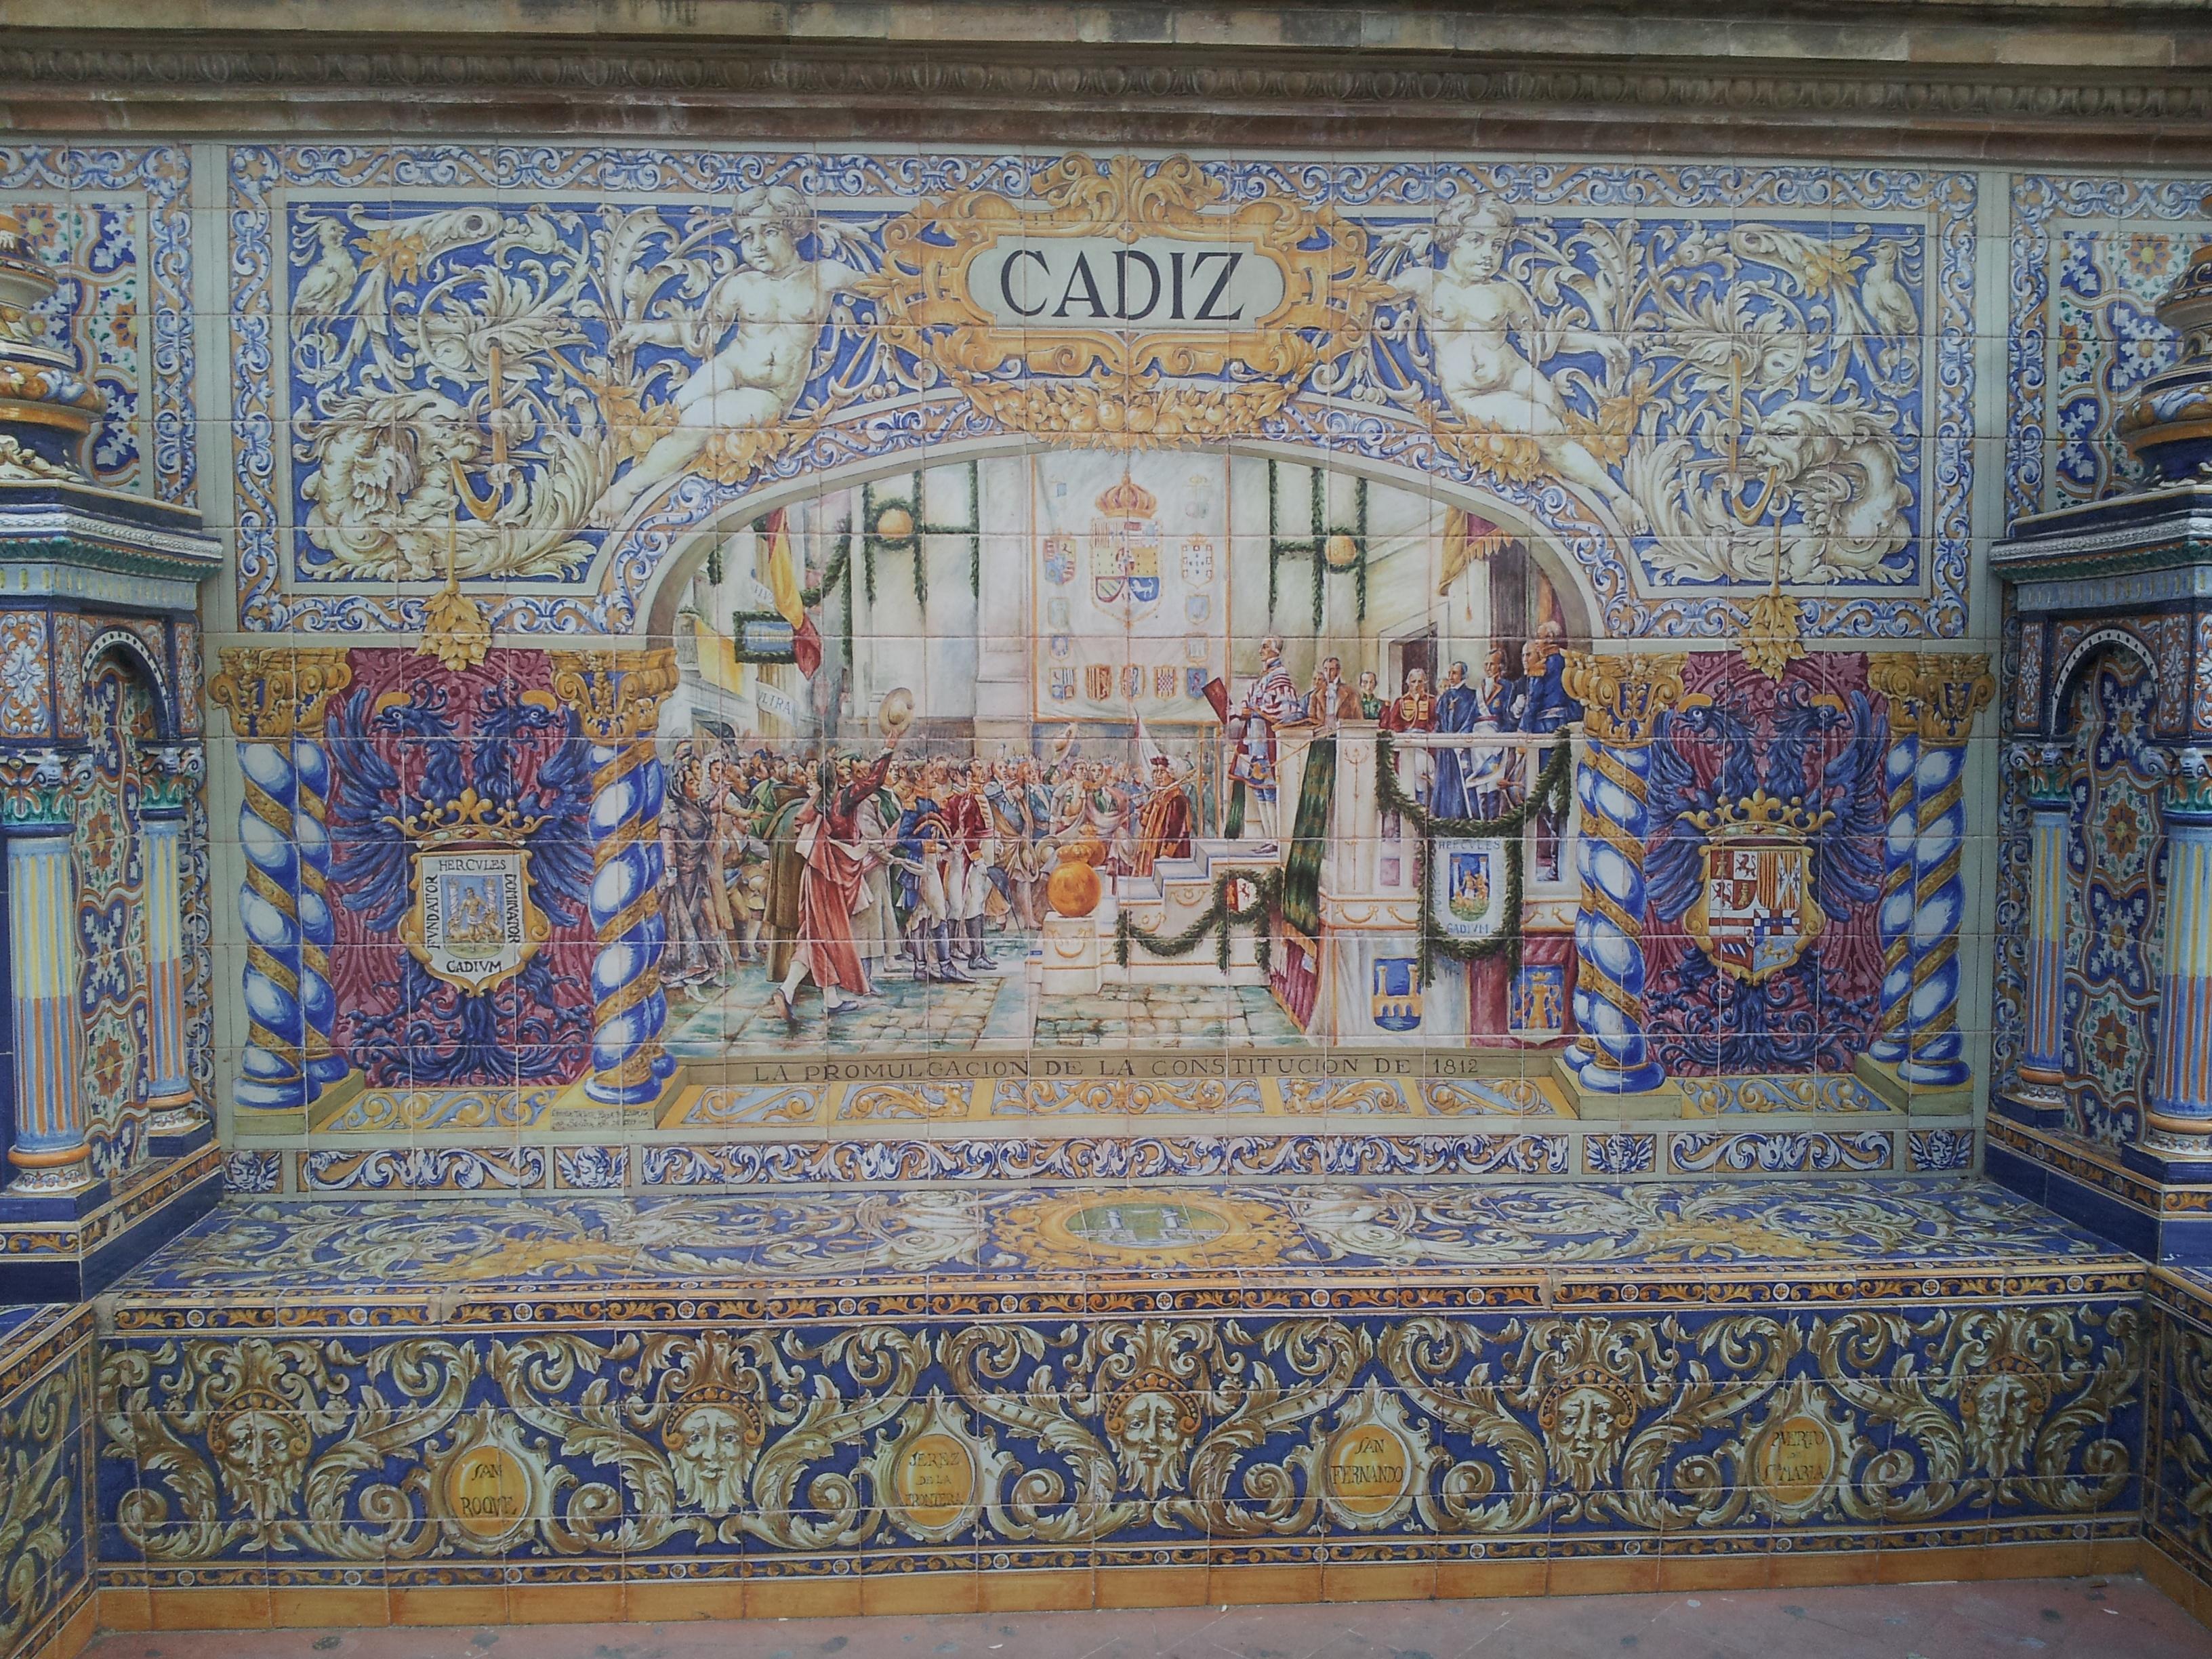 File pde sevilla azulejo c wikimedia commons for Azulejos cadiz